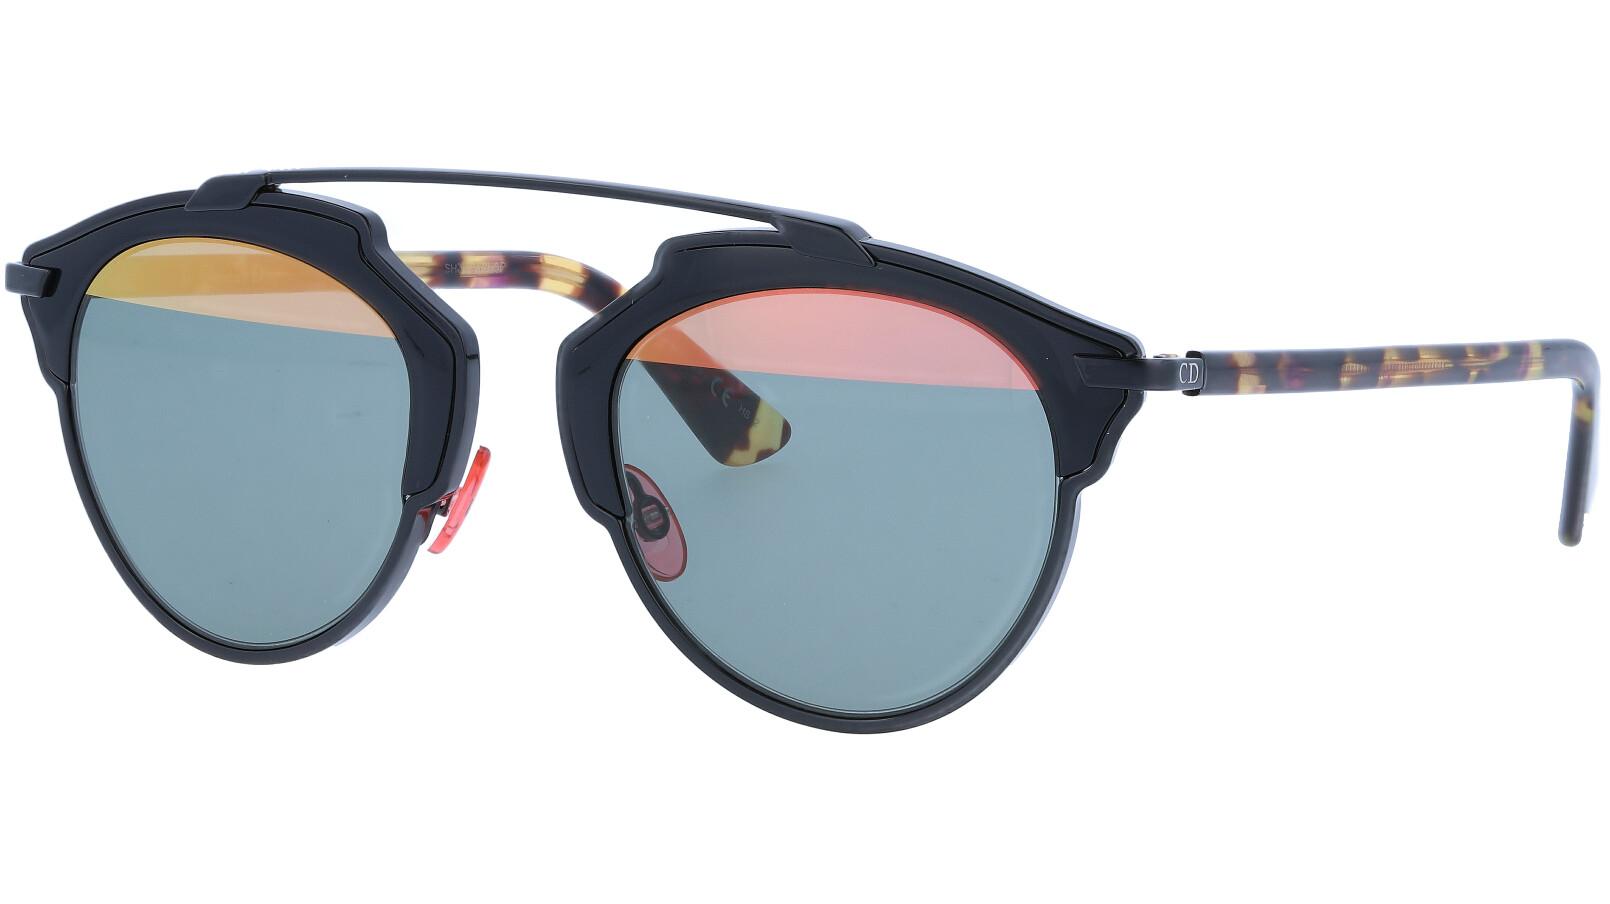 Dior SOREAL NT1ZJ 48 SHYBLCK Sunglasses